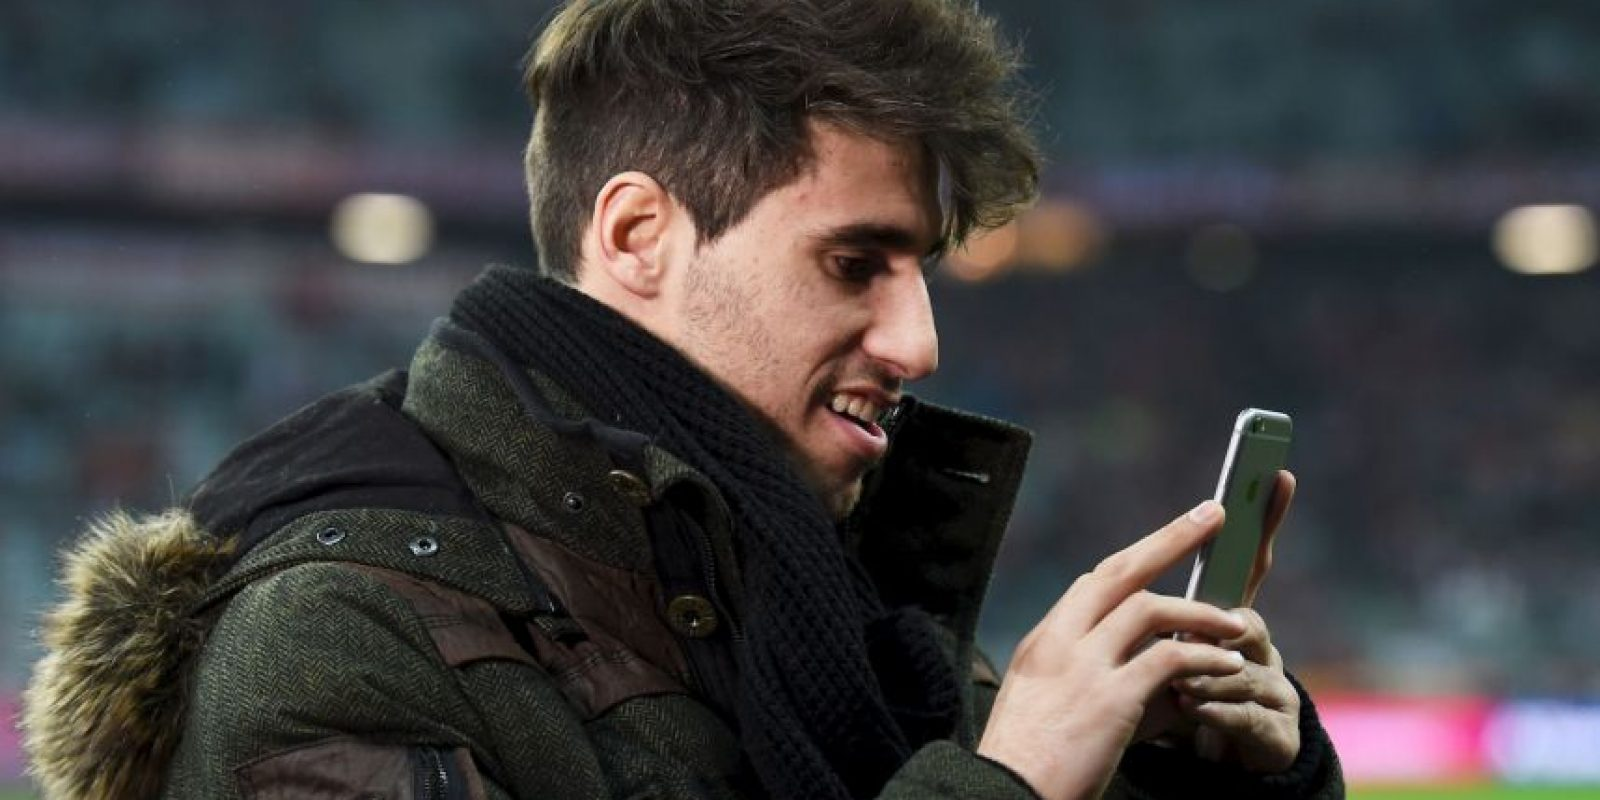 El futbolista español del Bayer Munich, Javi Martínez Foto:Getty Images